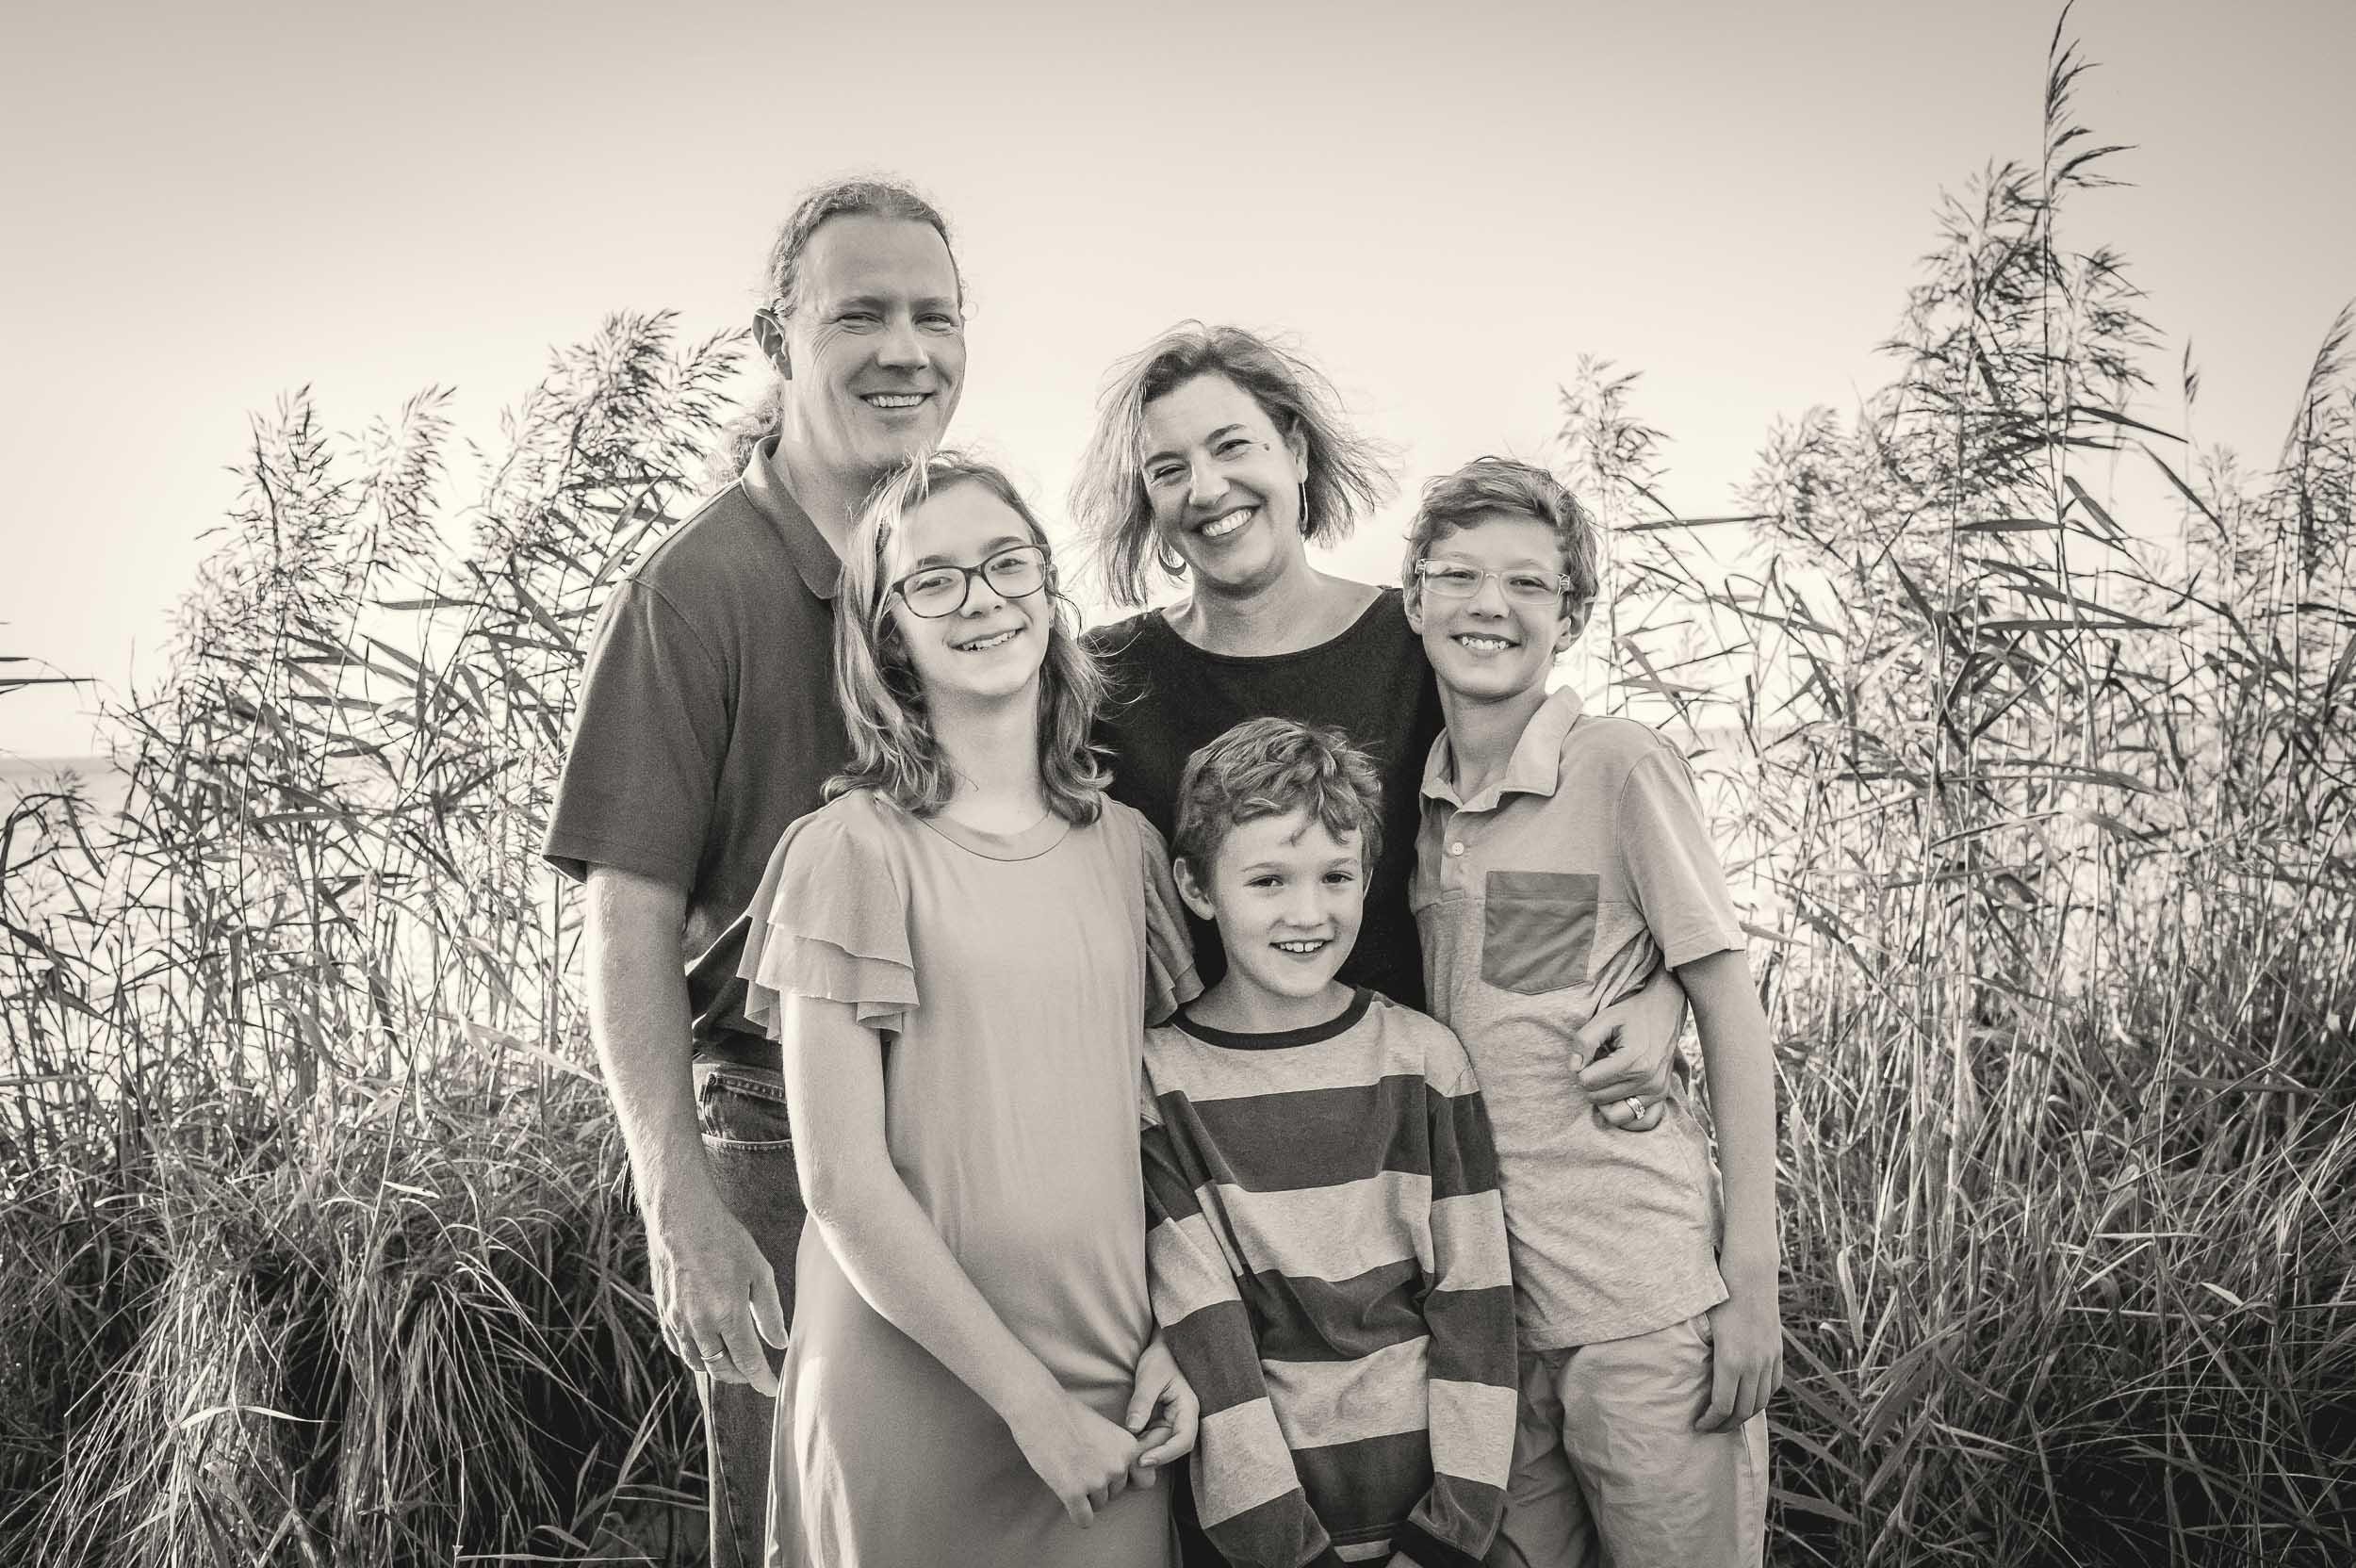 Family_Senior_Wedding_Maryland_Photographer_Sonny_and_Allison_Favorites_Easton_Crofton_Oxford-76.jpg